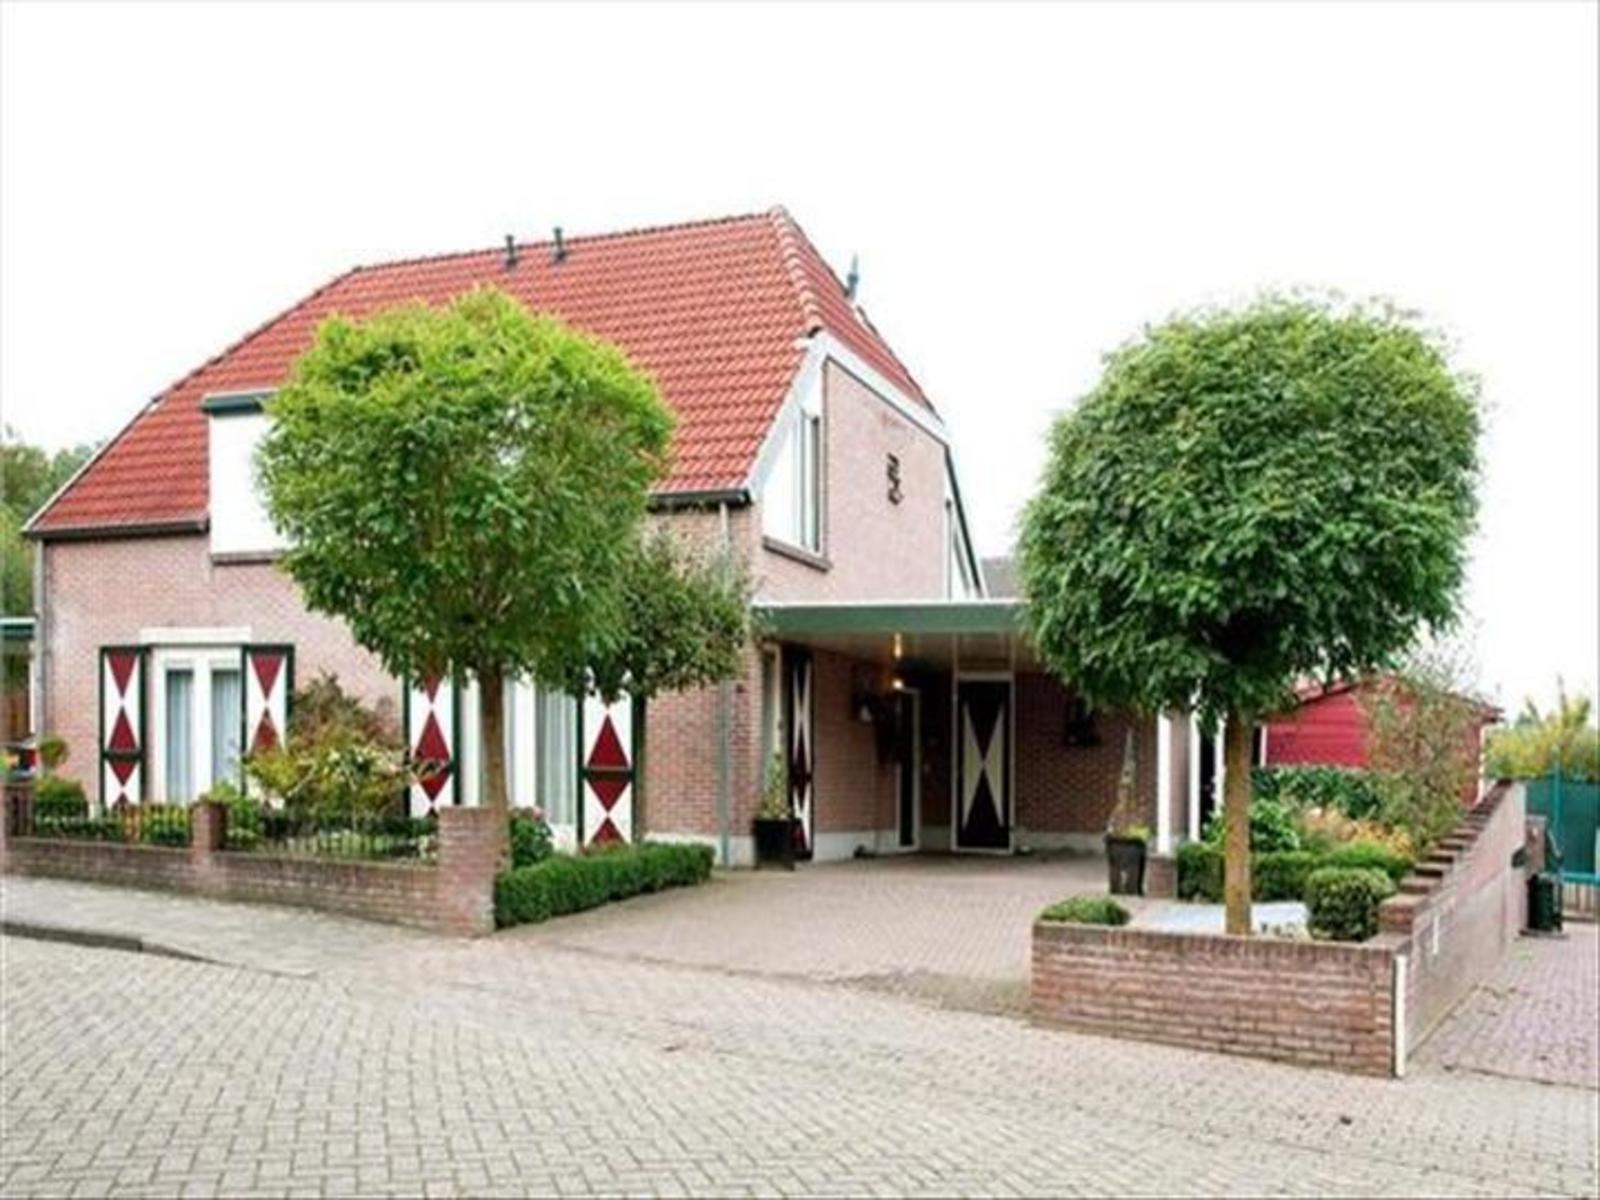 De Zandakkers 1a, 's-Heerenberg